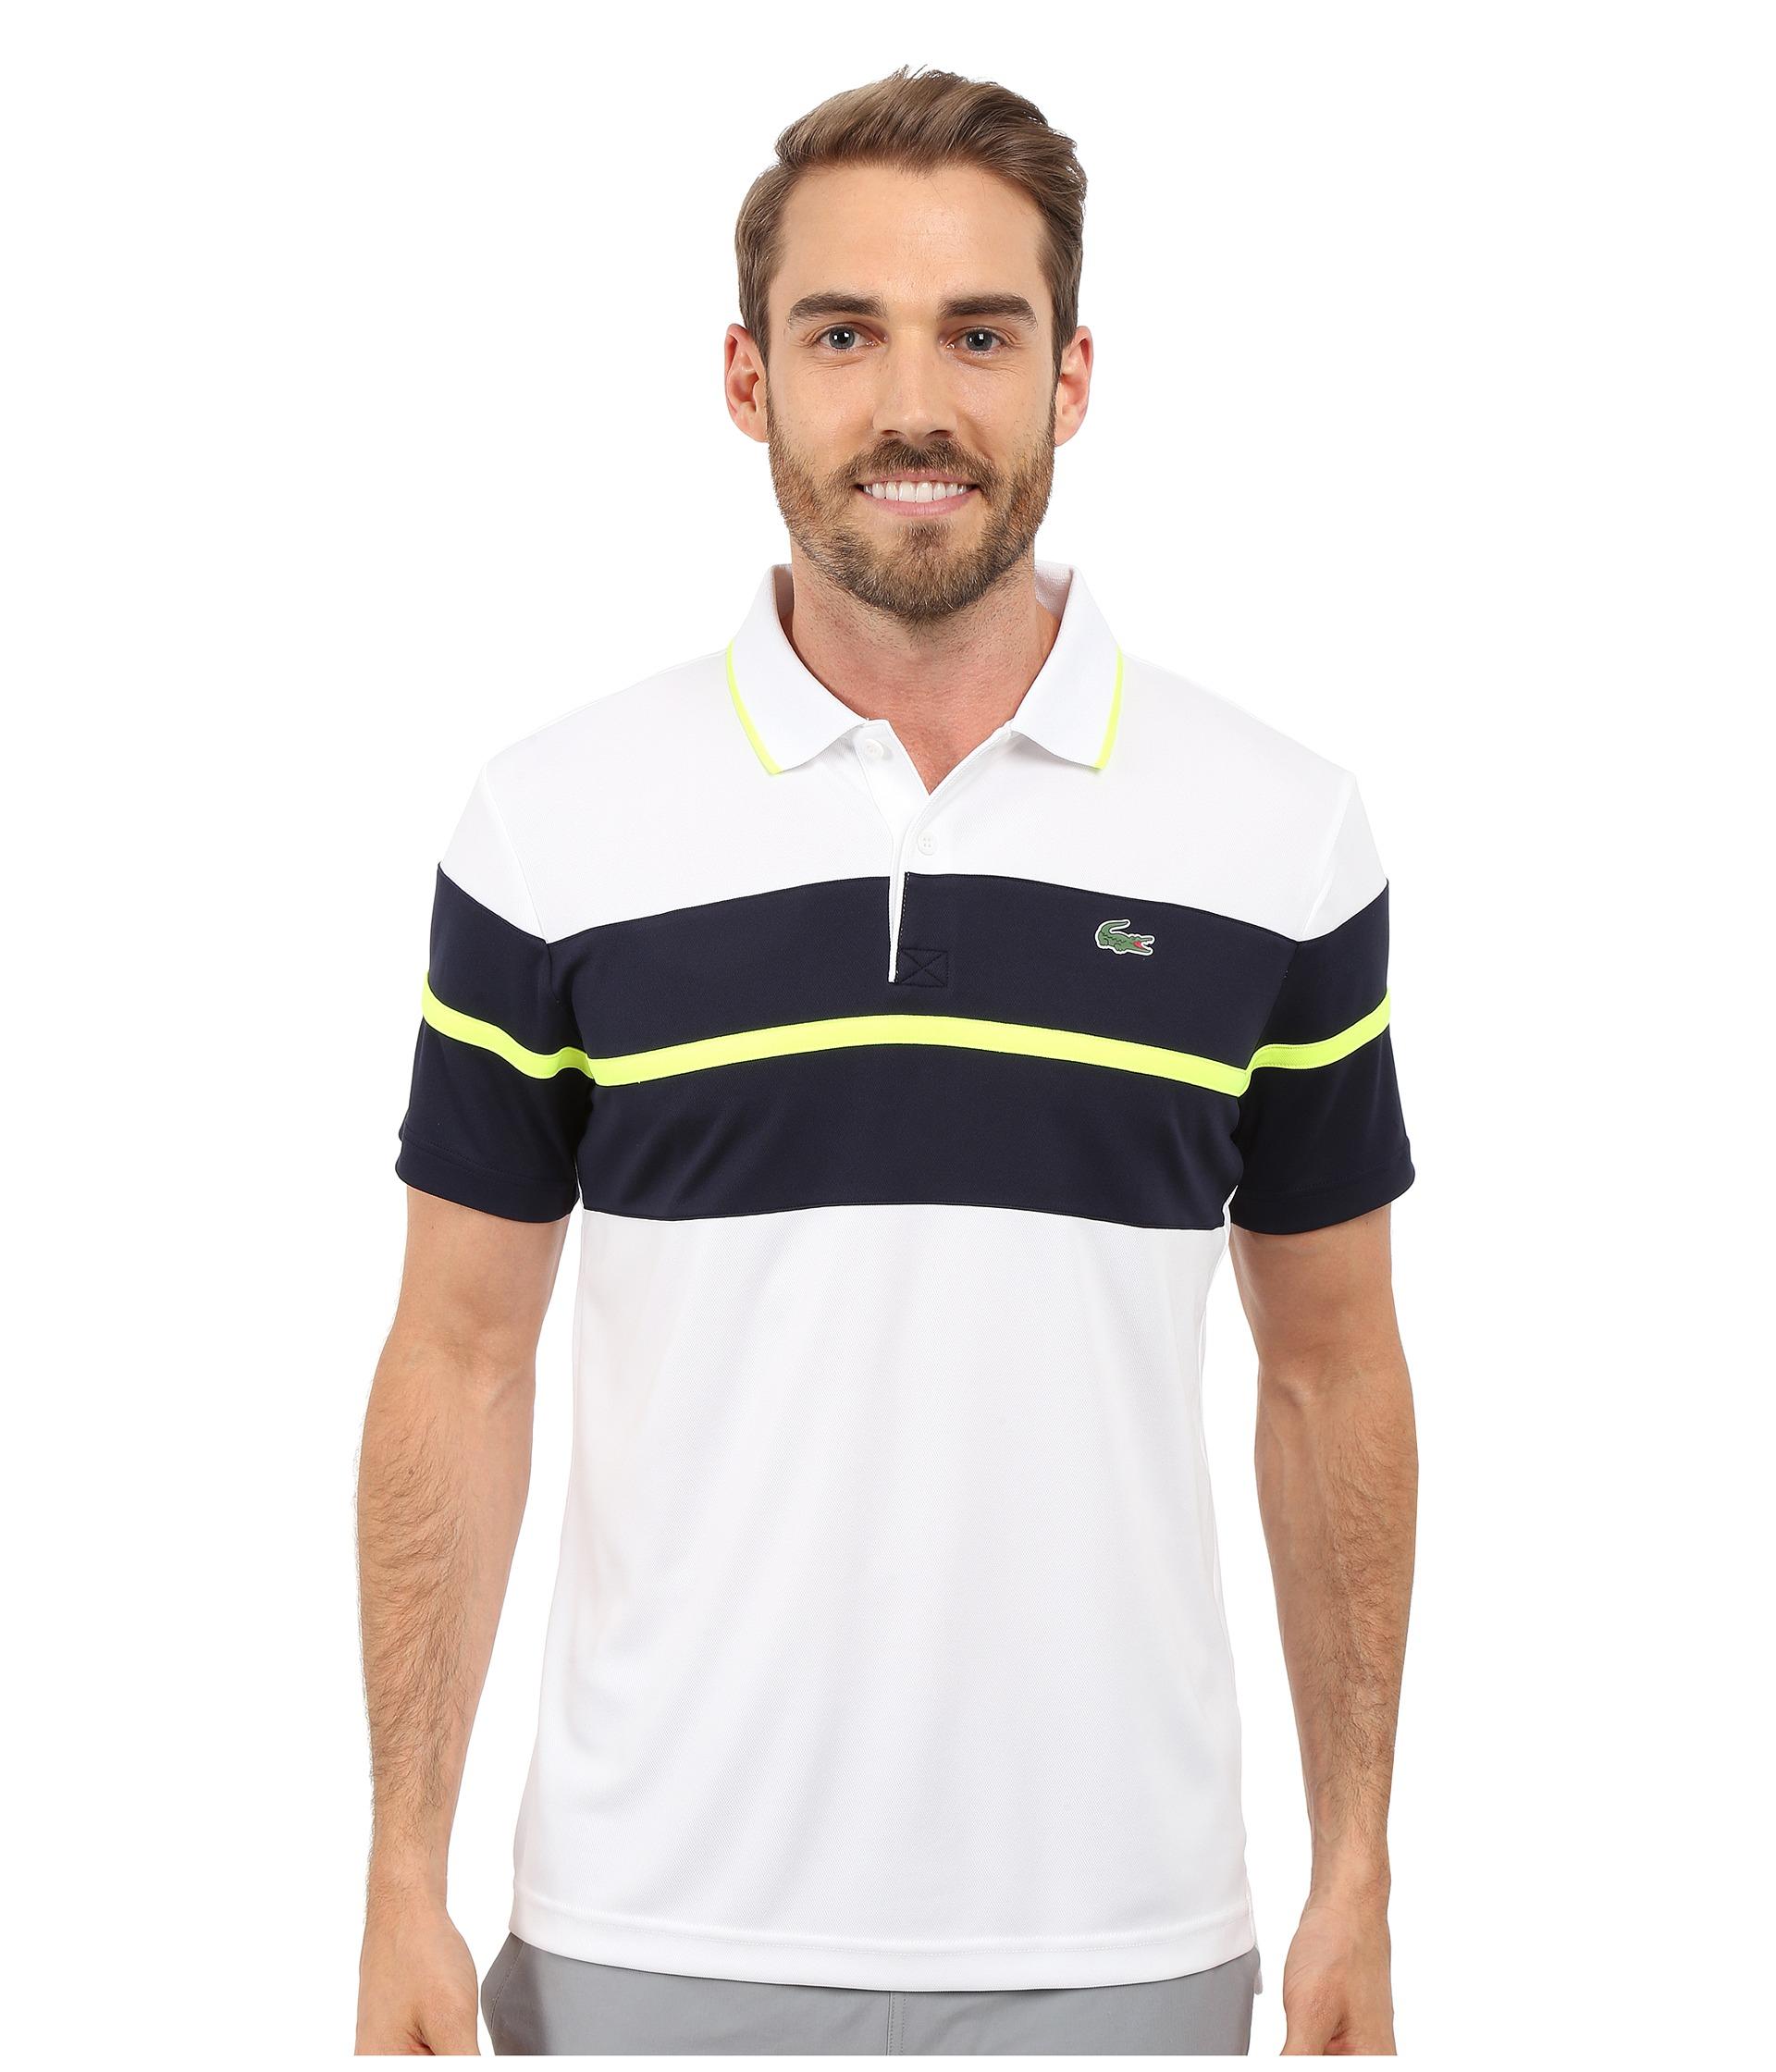 f7fe2c9c Lacoste Sport Ultra Dry Chest Stripe Polo in White for Men - Lyst